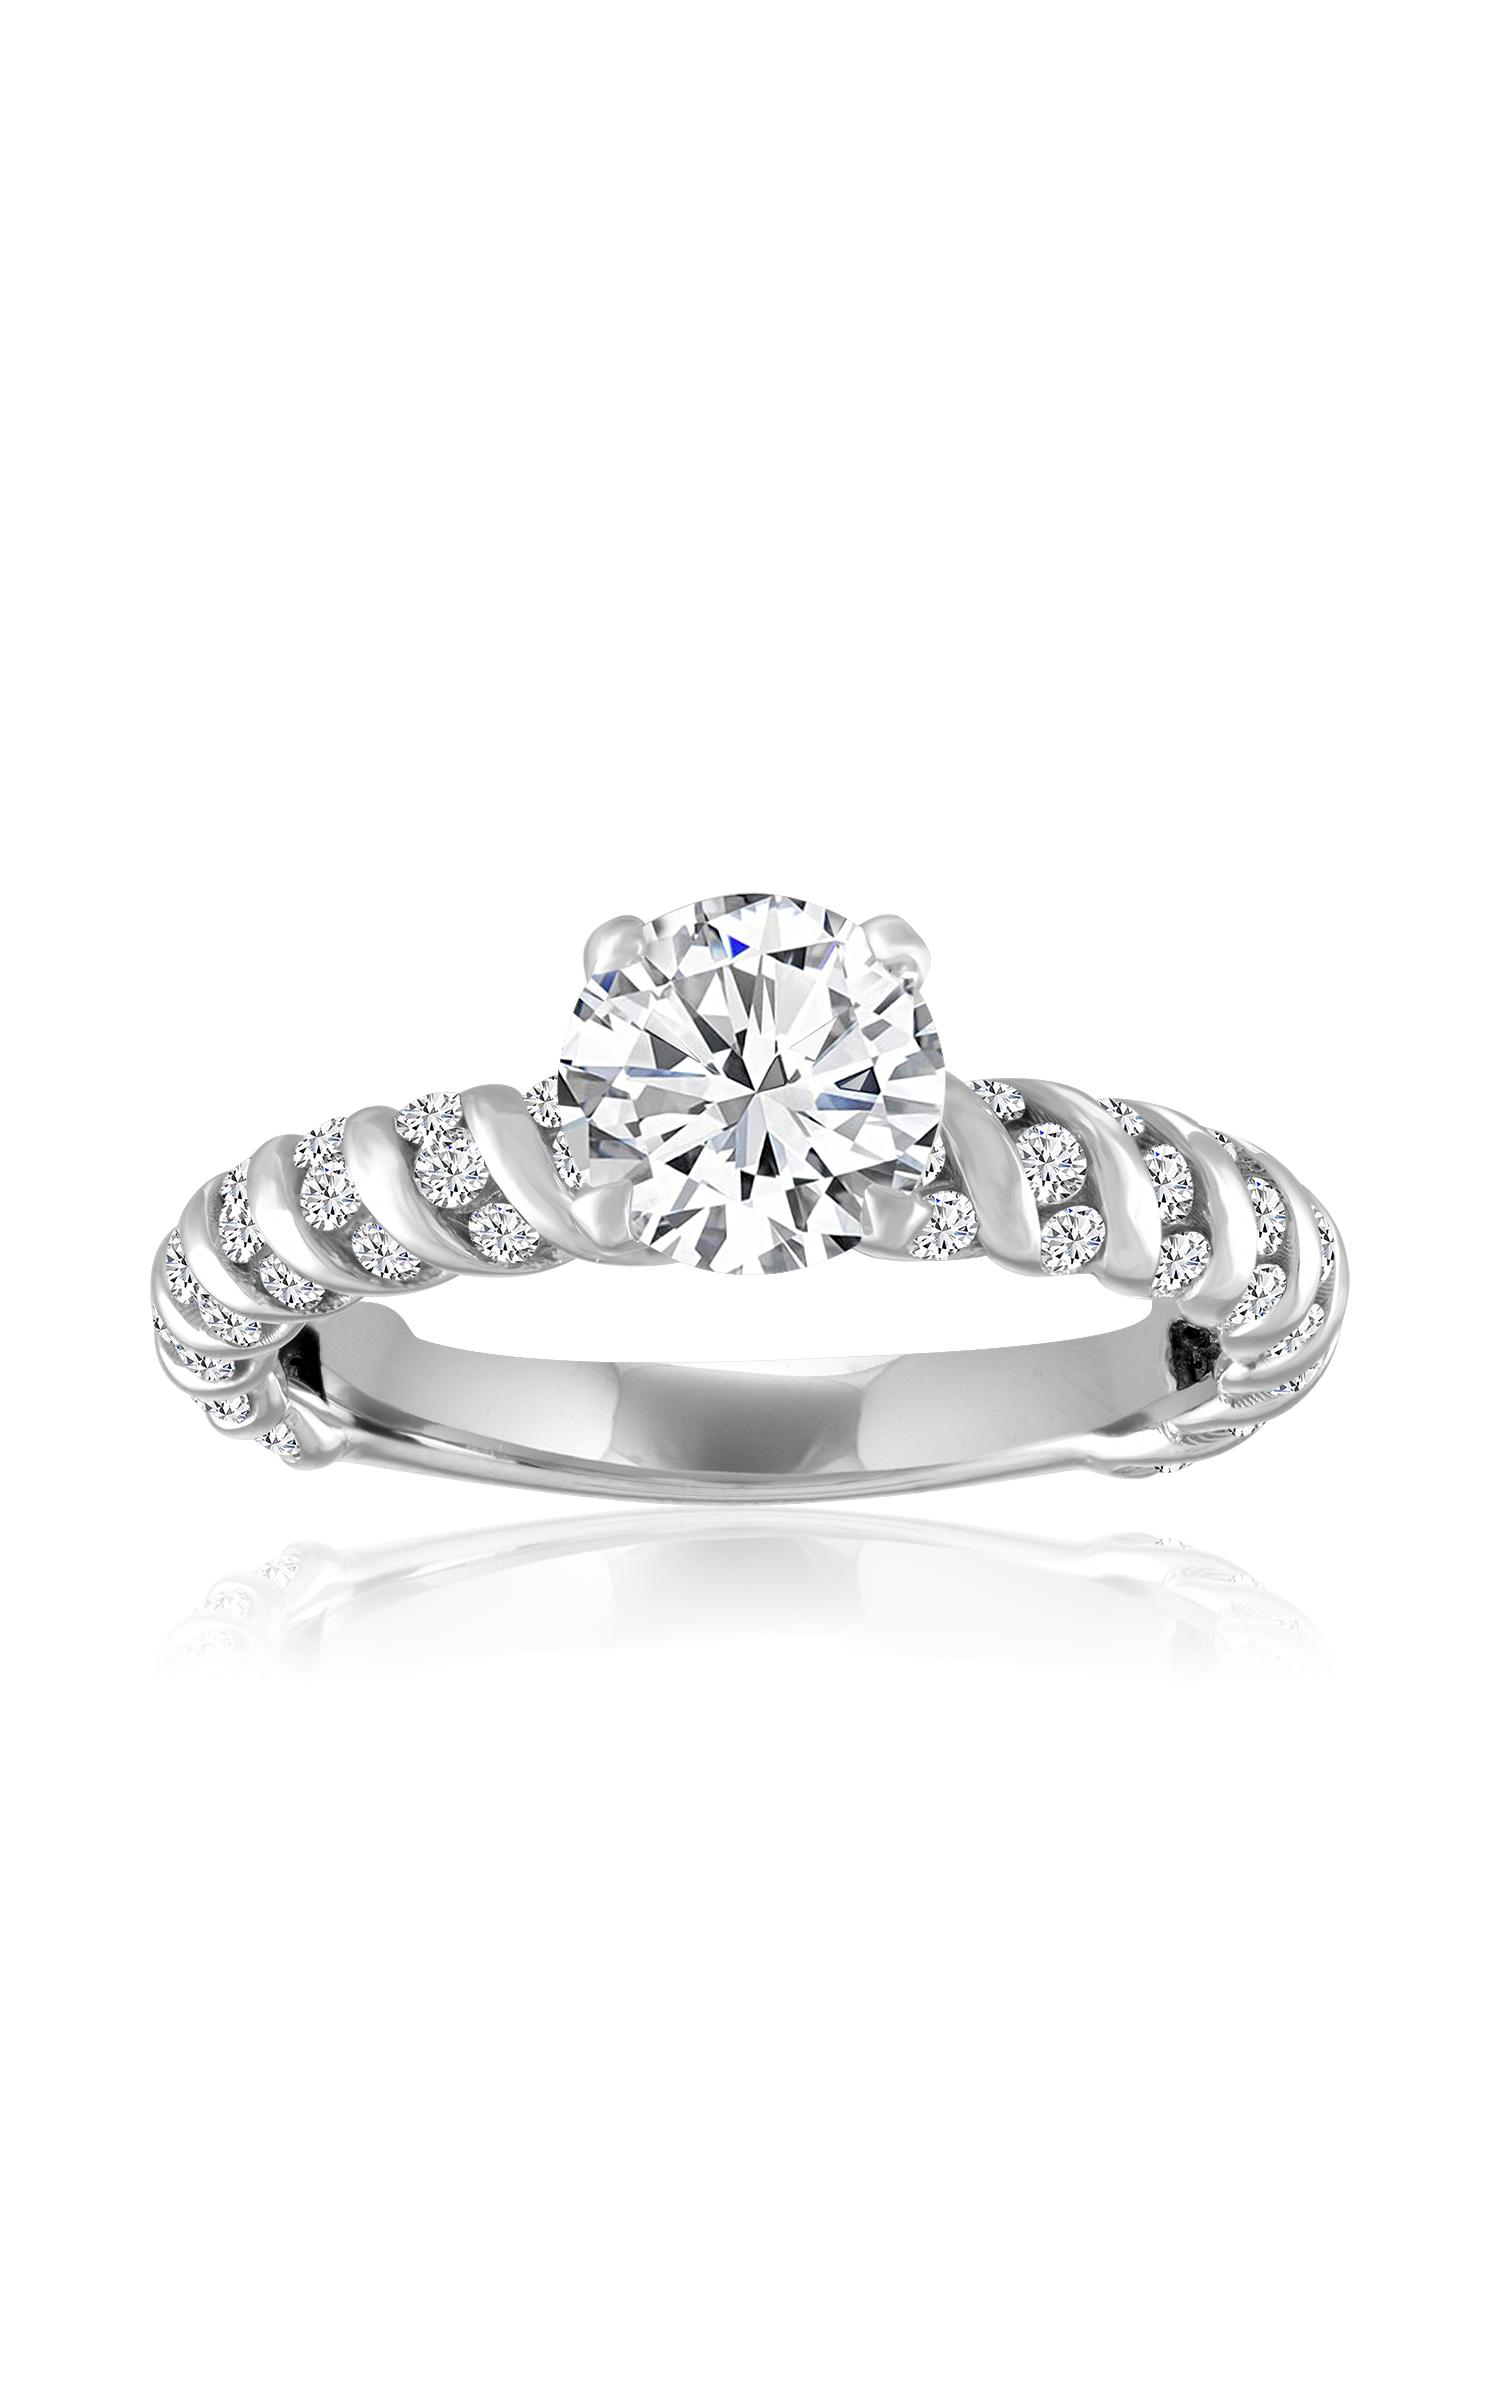 Imagine Bridal Engagement Rings 62516D-2 5 product image